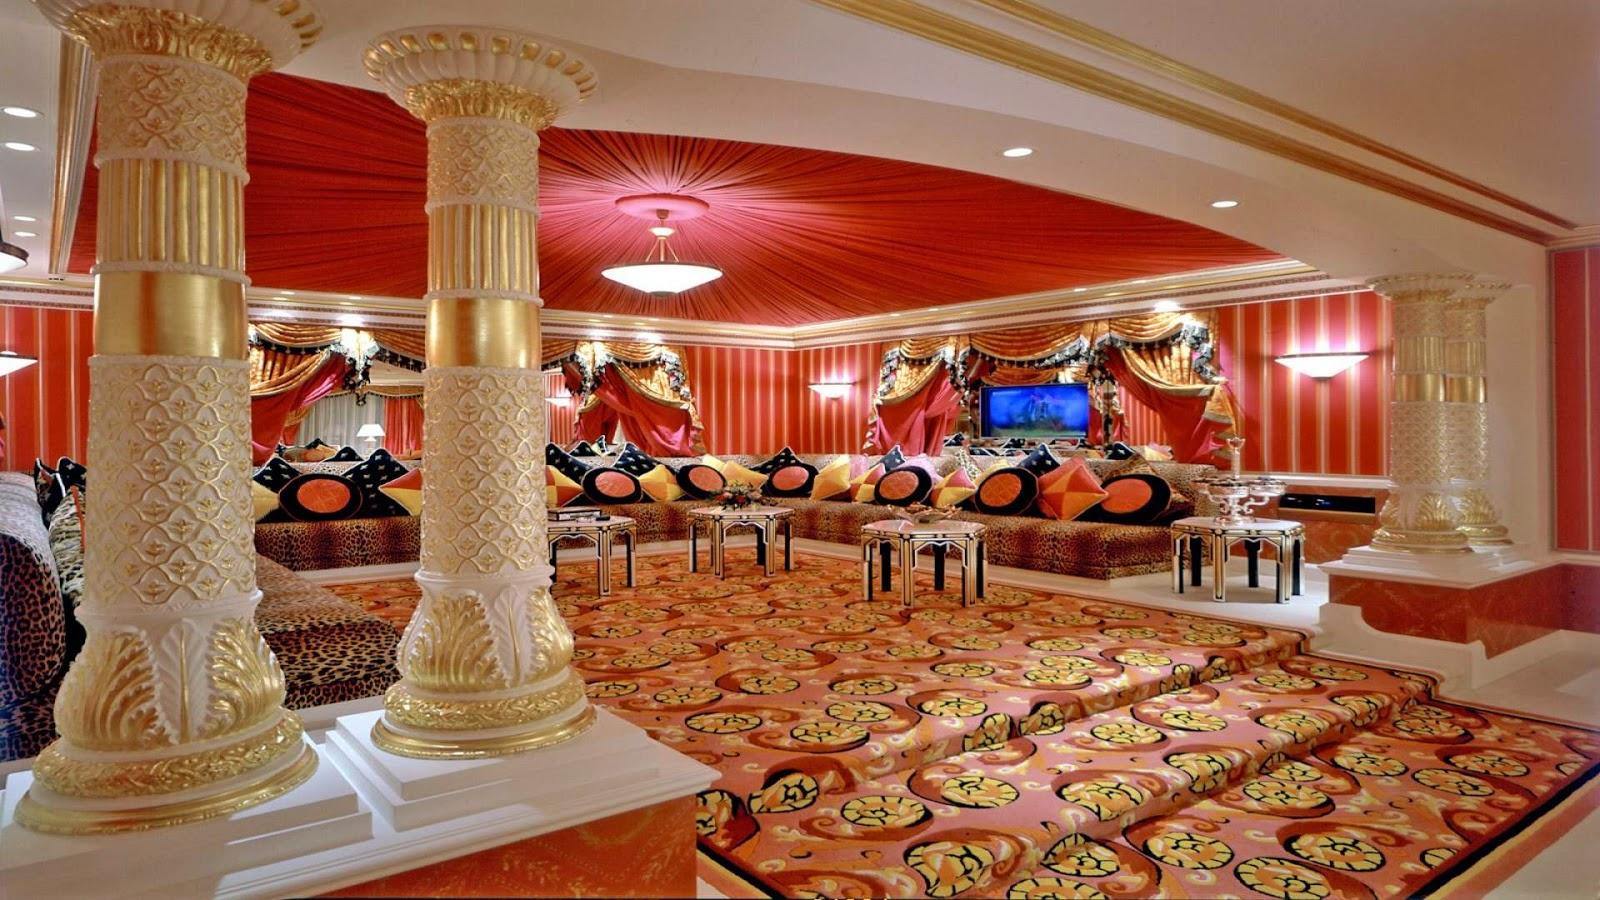 Inside view of Burj Al Arab a seven star hotel.